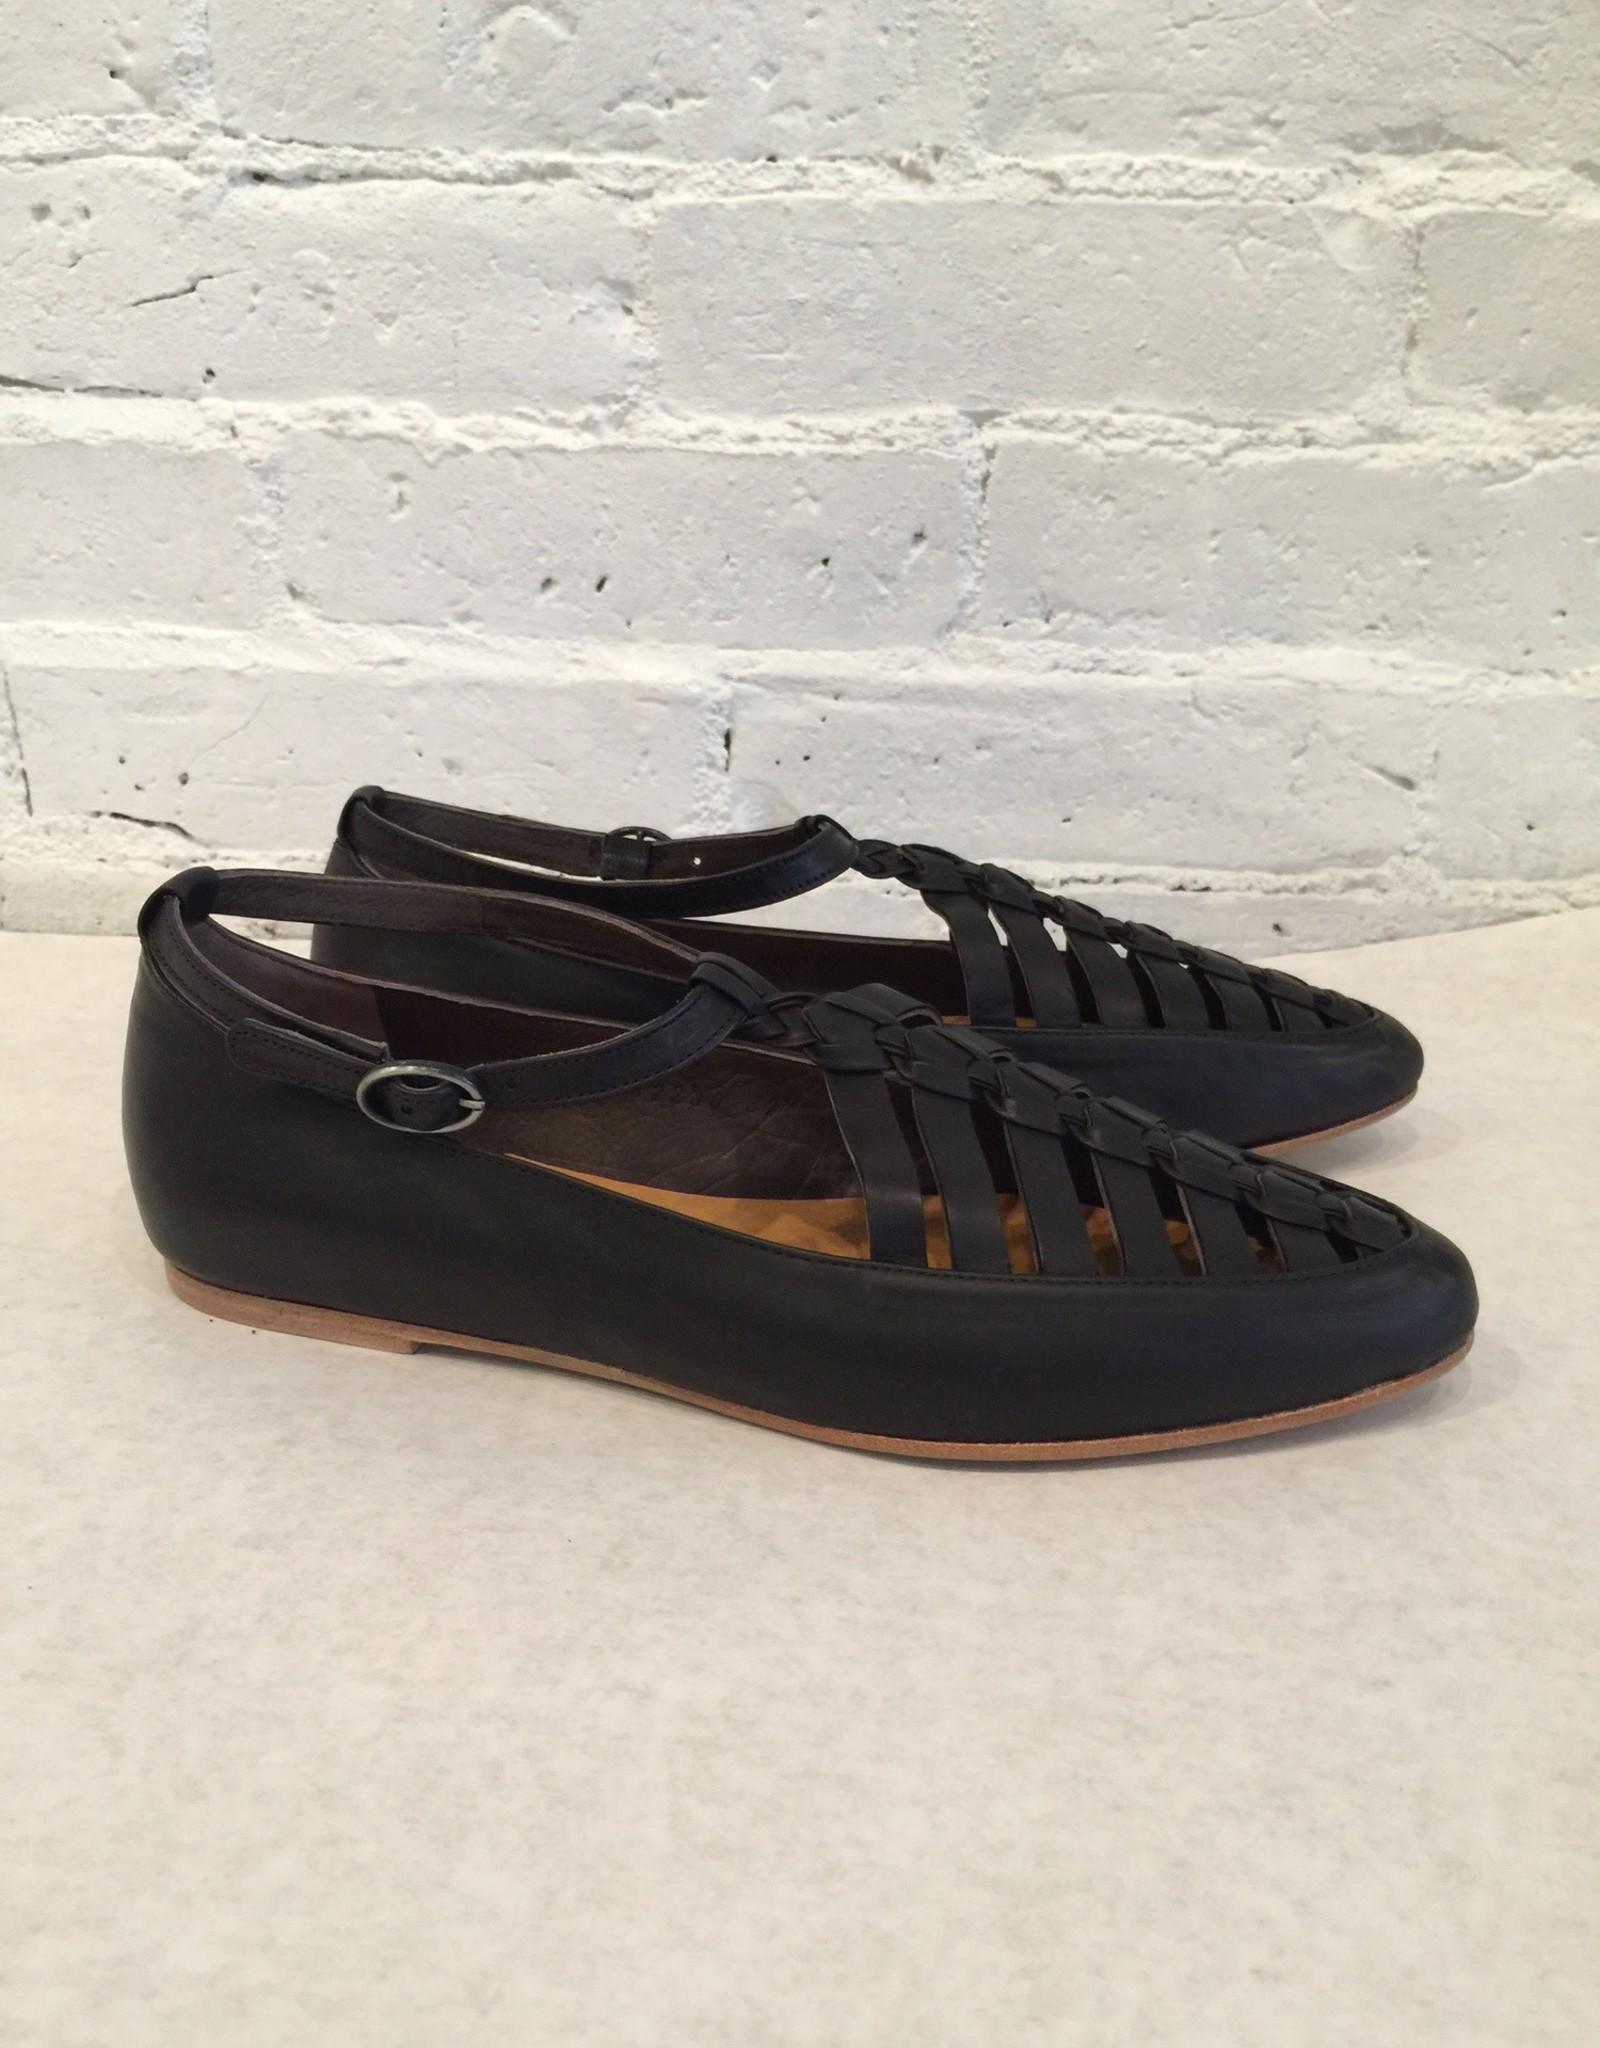 Coclico Leather Ringo Black Flat